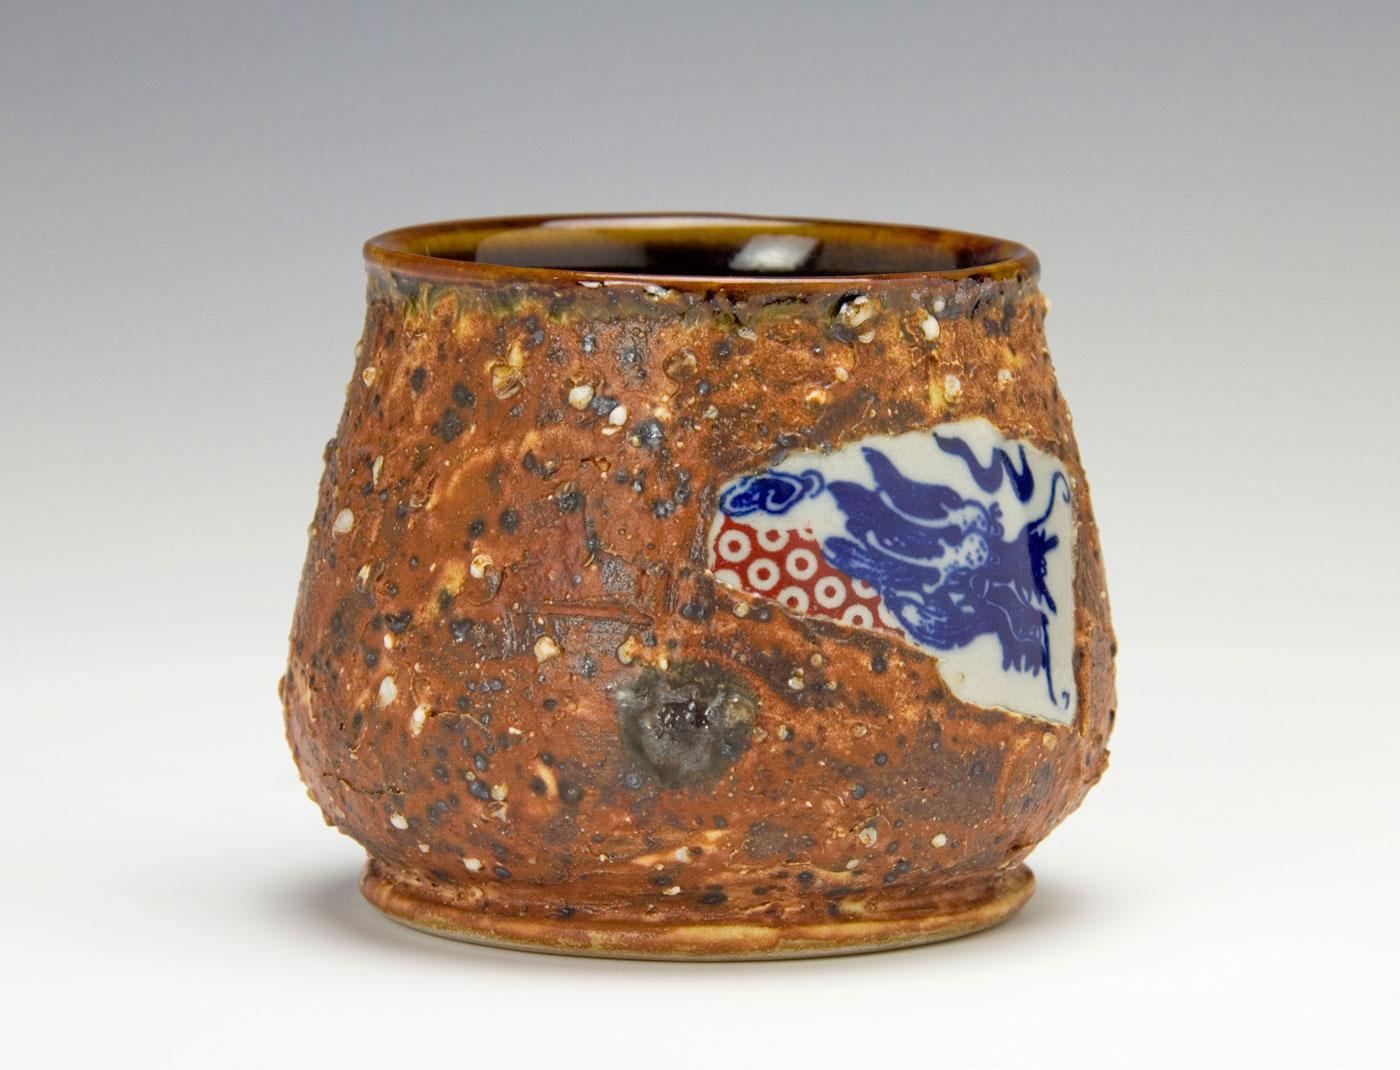 Contemporary-American-Yunomi-Bruce-Gholson-Bulldog-Pottery.jpg